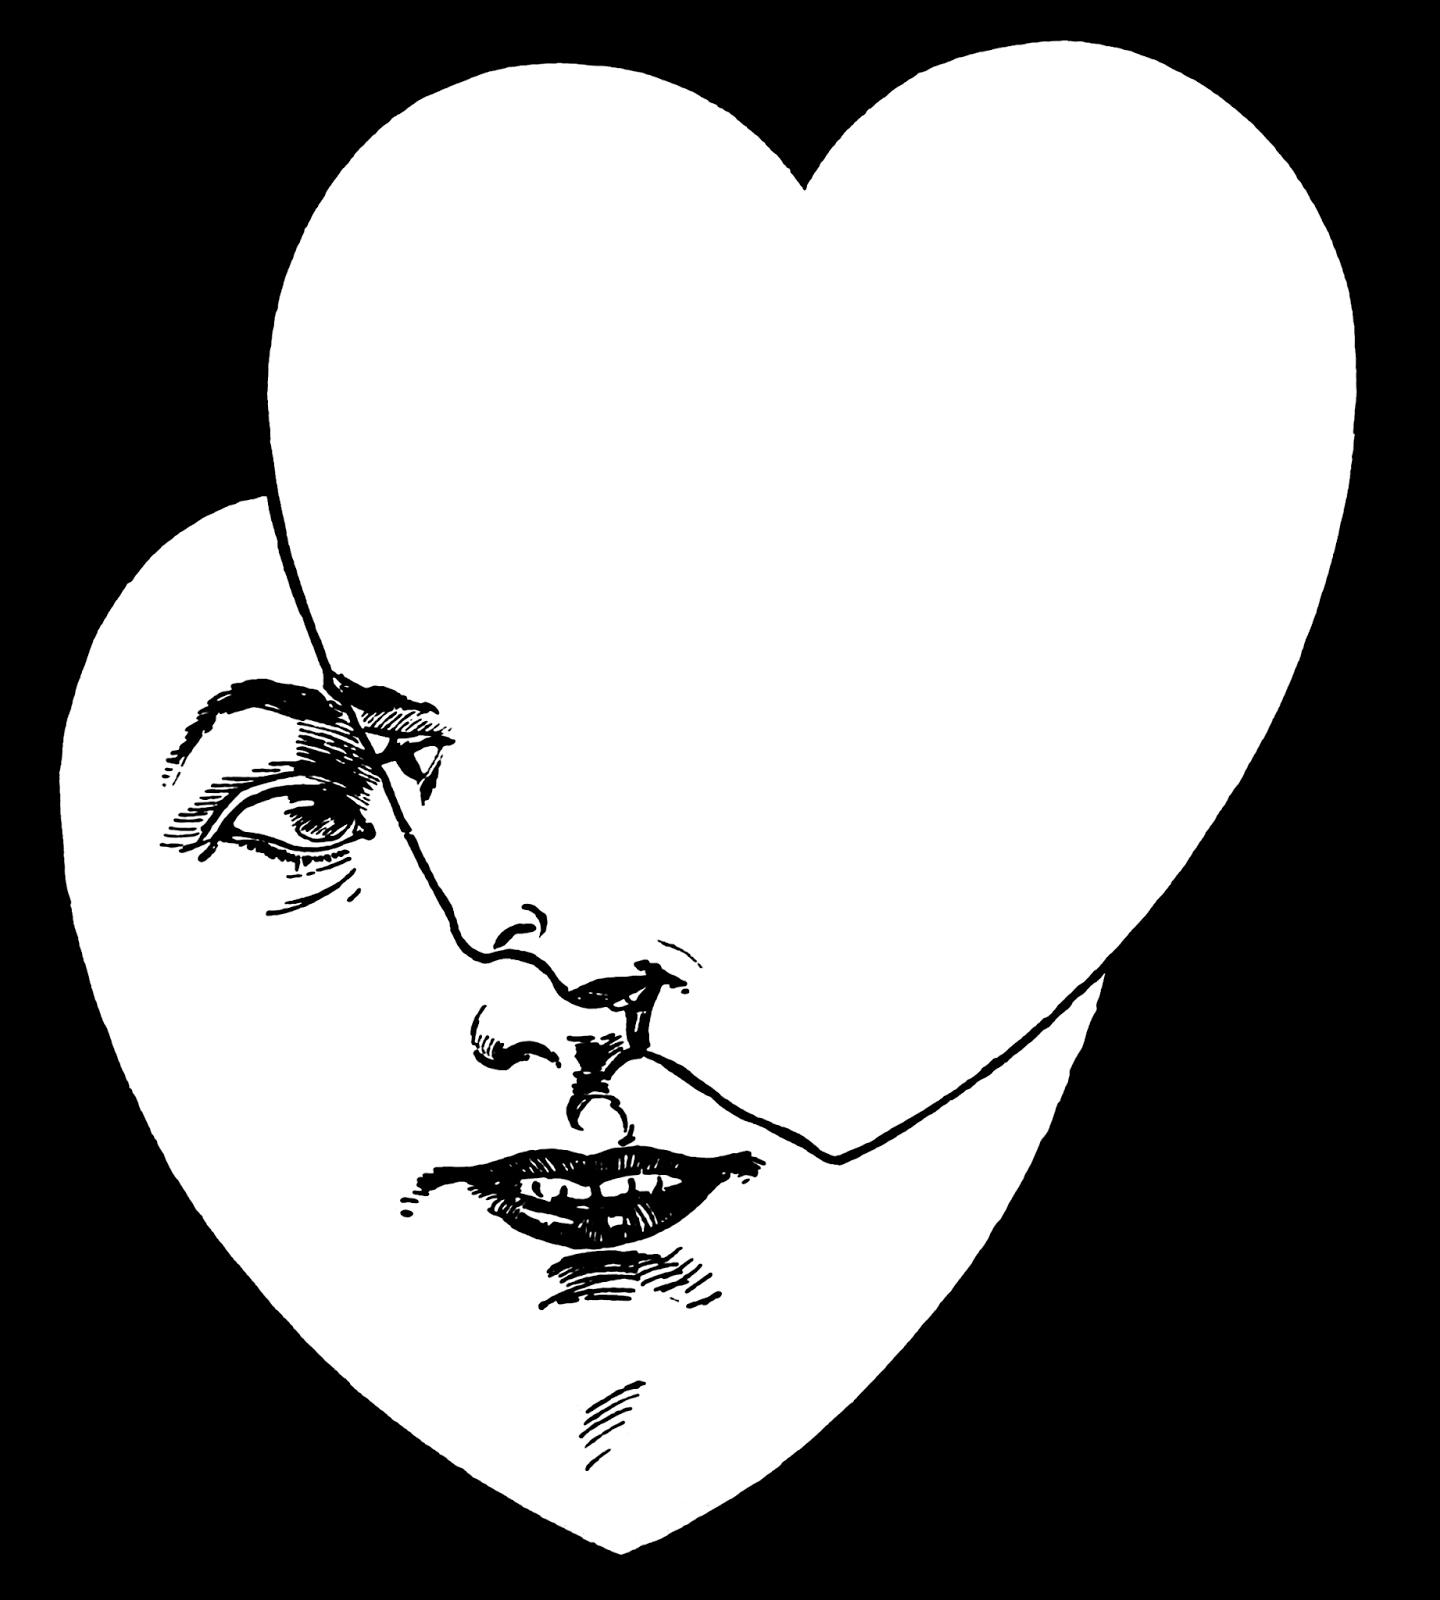 Valentines heart clipart black and white black and white Vintage Snips and Clips black and white